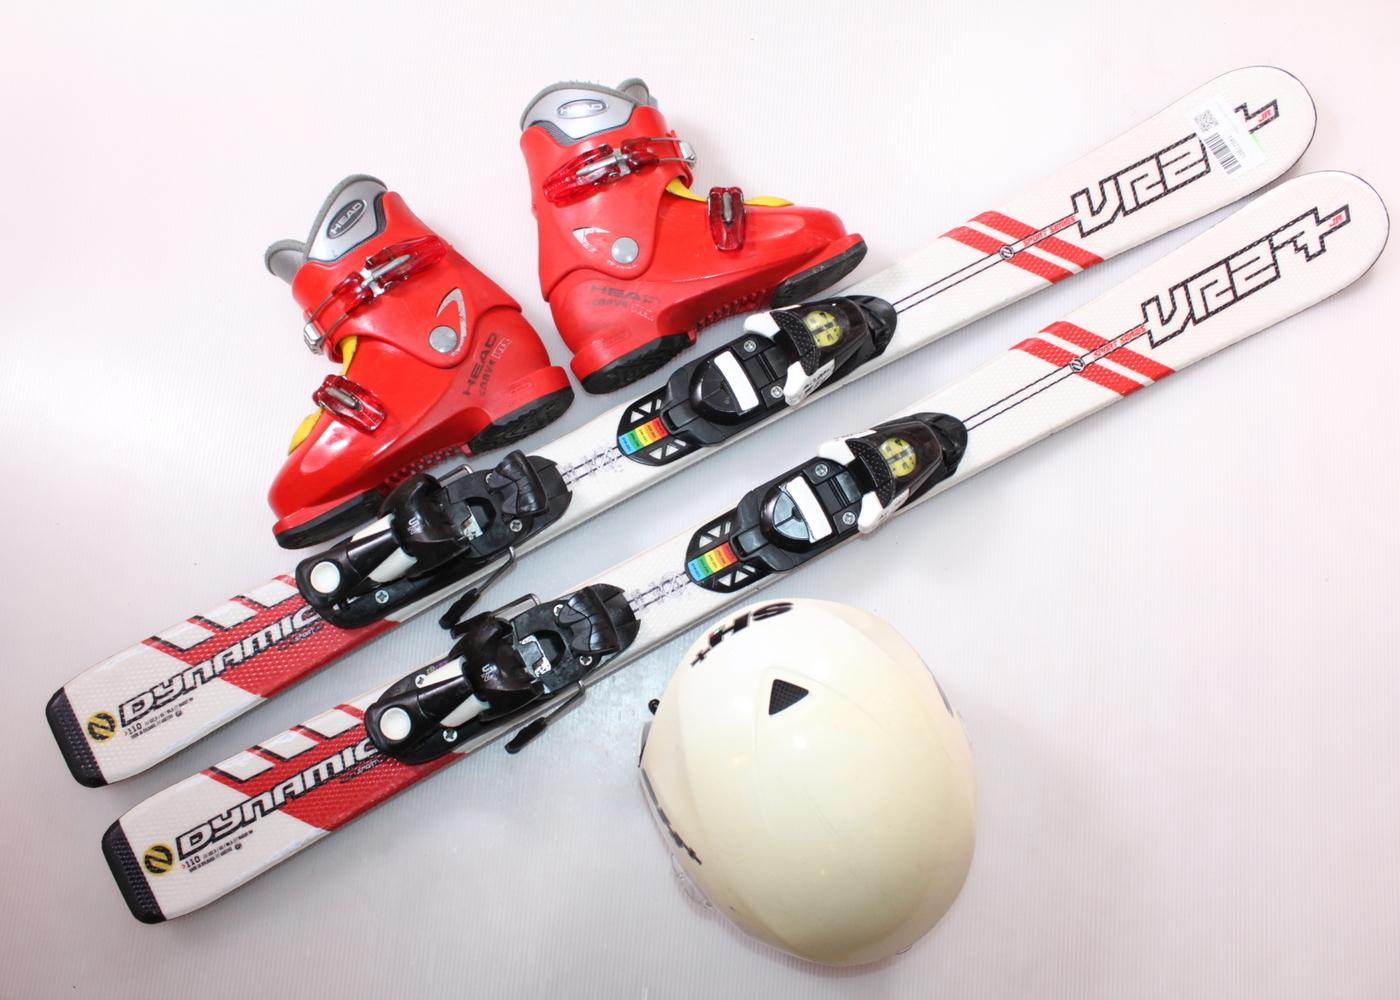 Dětské lyže DYNASTAR VR 27 110 cm + lyžáky  32EU + helma